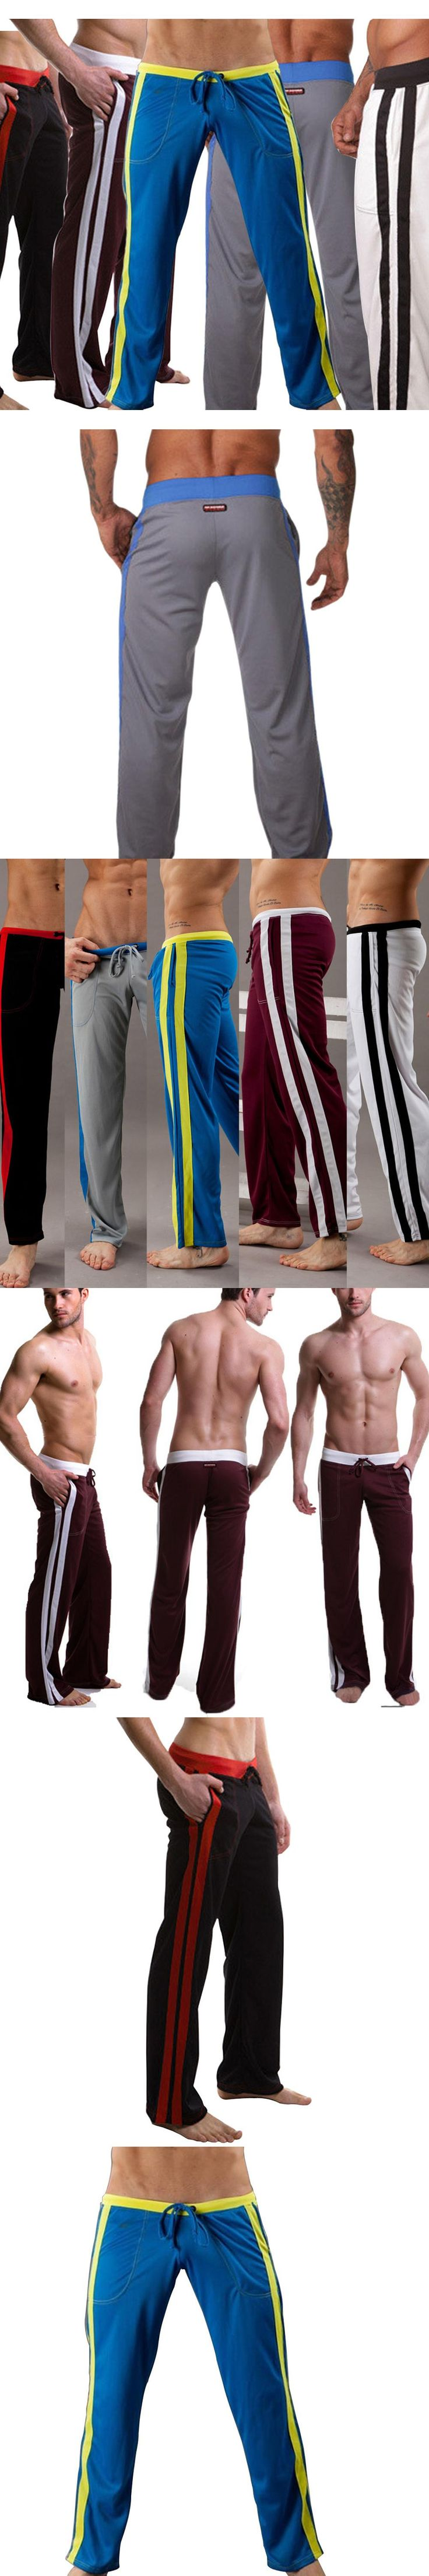 Men Underwear Breathable  Pants Comfort Tether Casual Dance Baggy Trousers Slacks -MX8